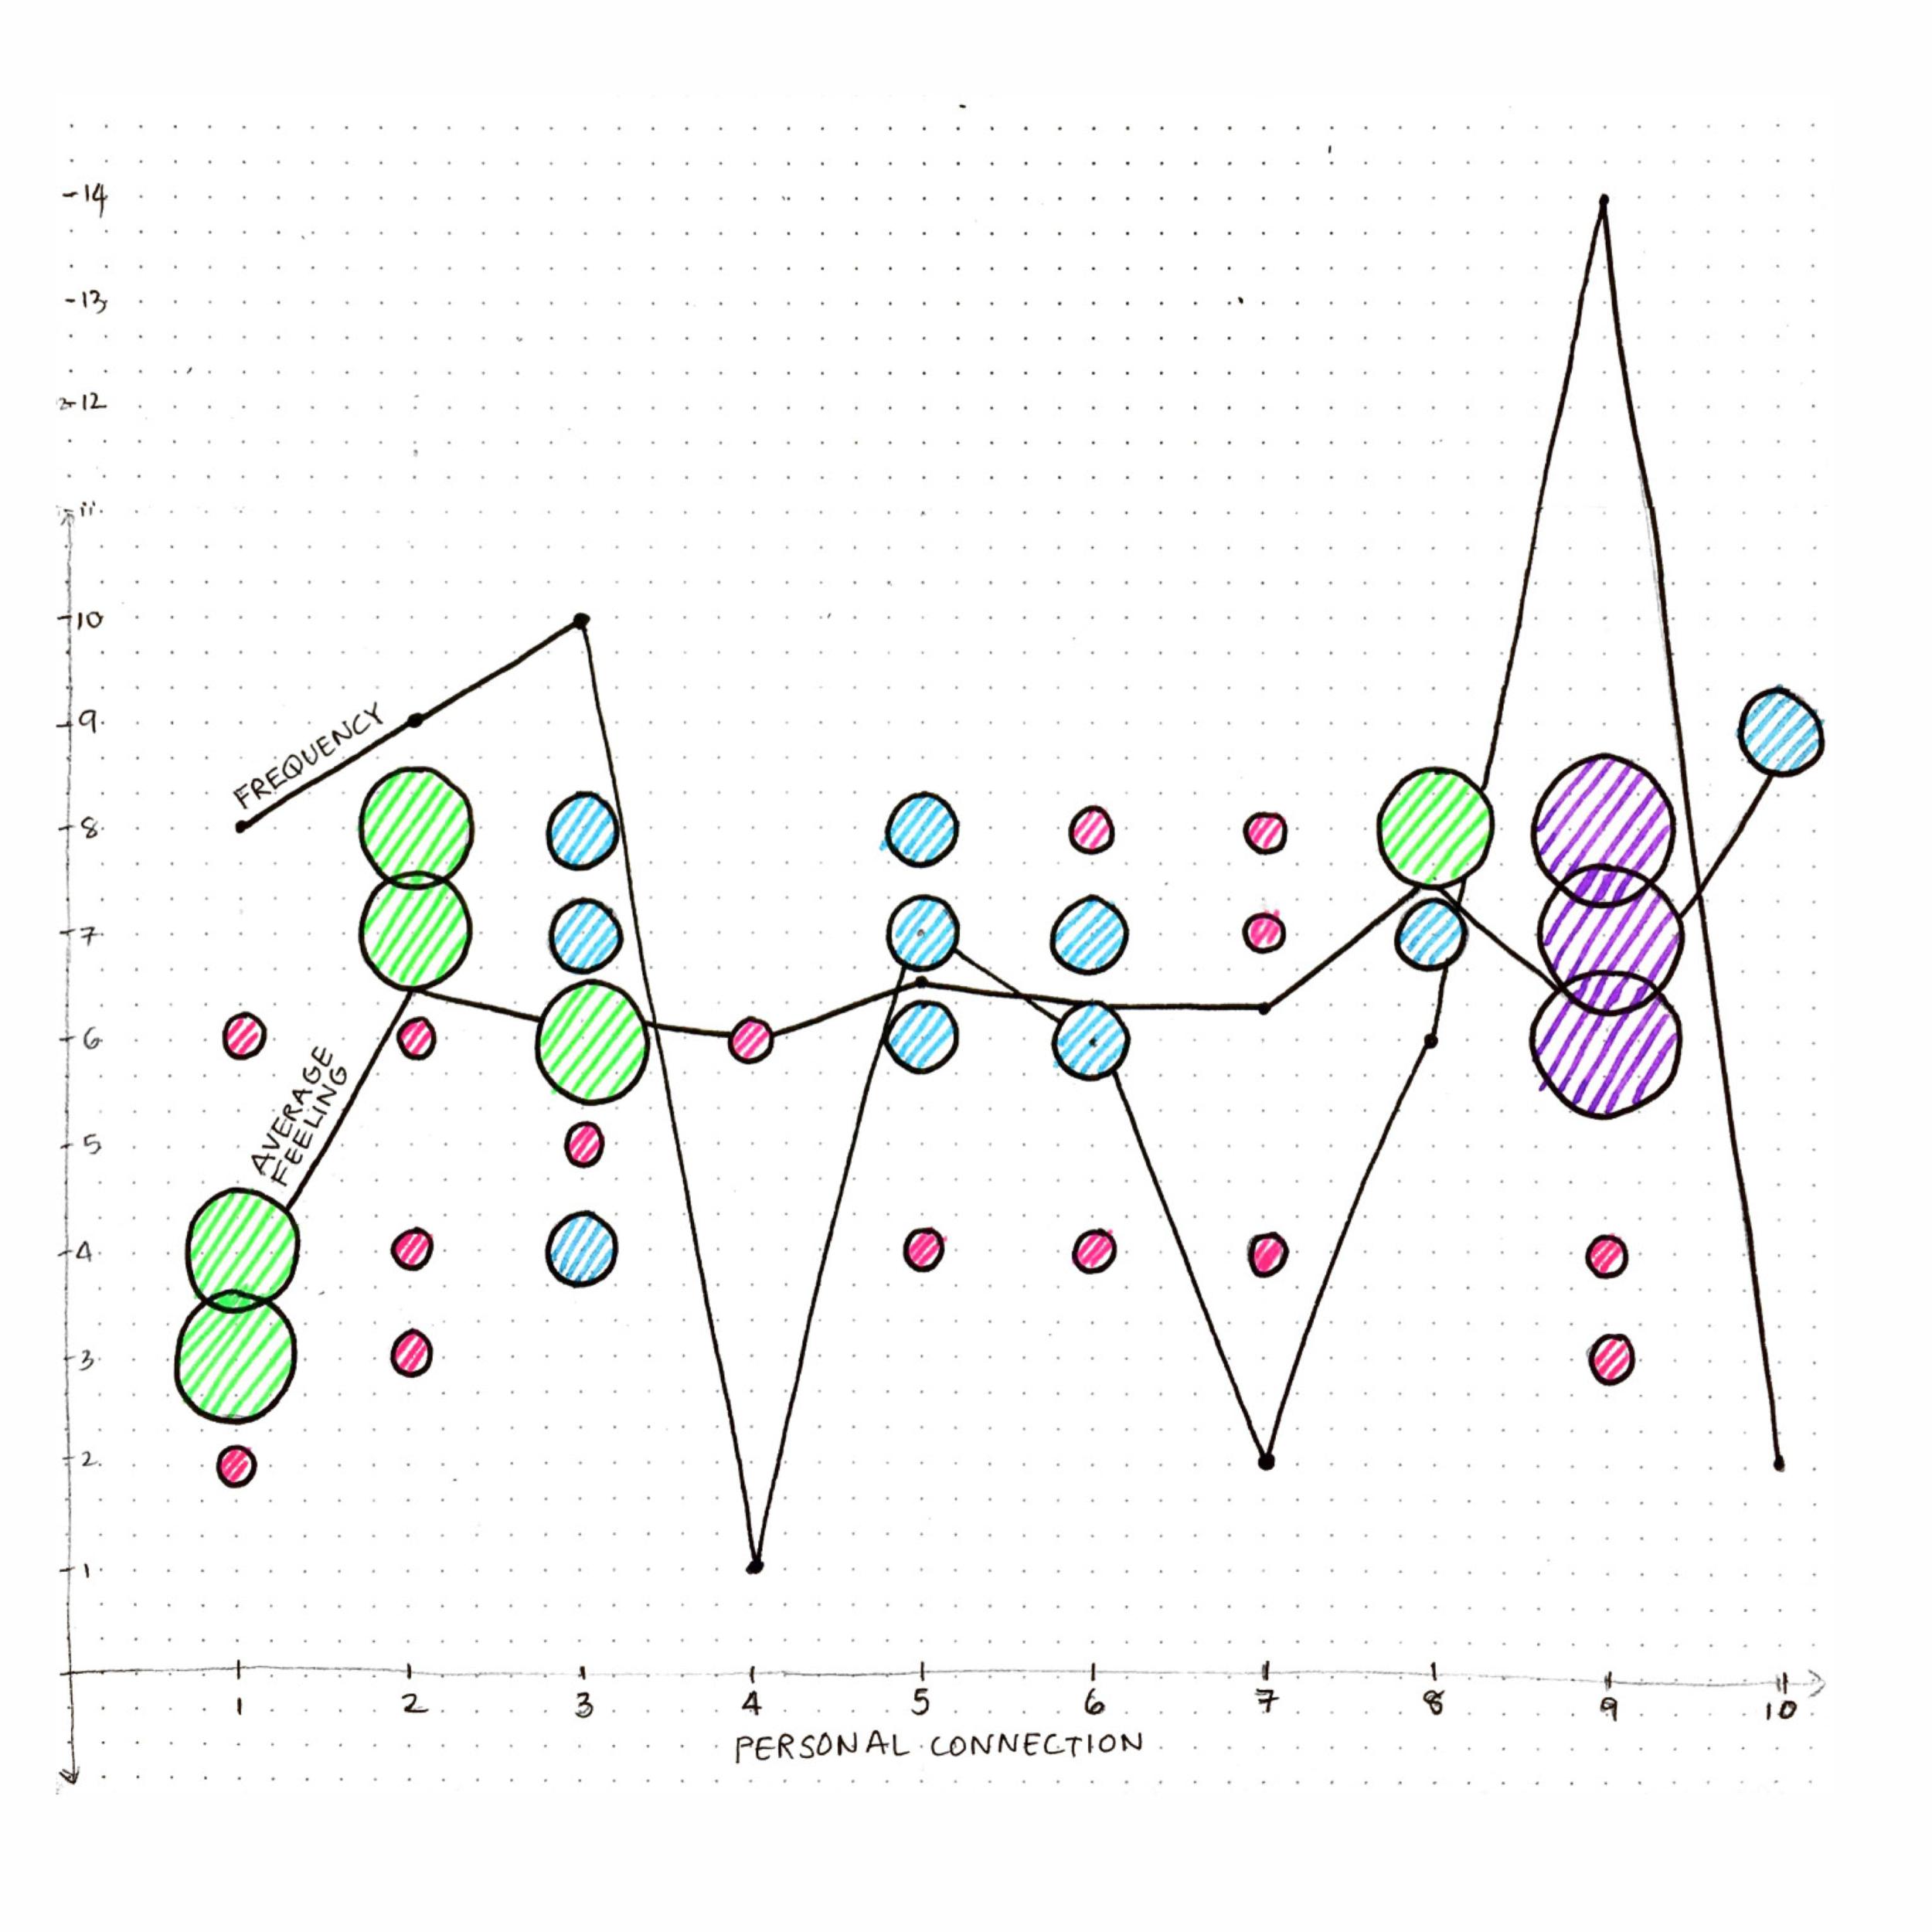 spotify_datavis-sketch-1.png